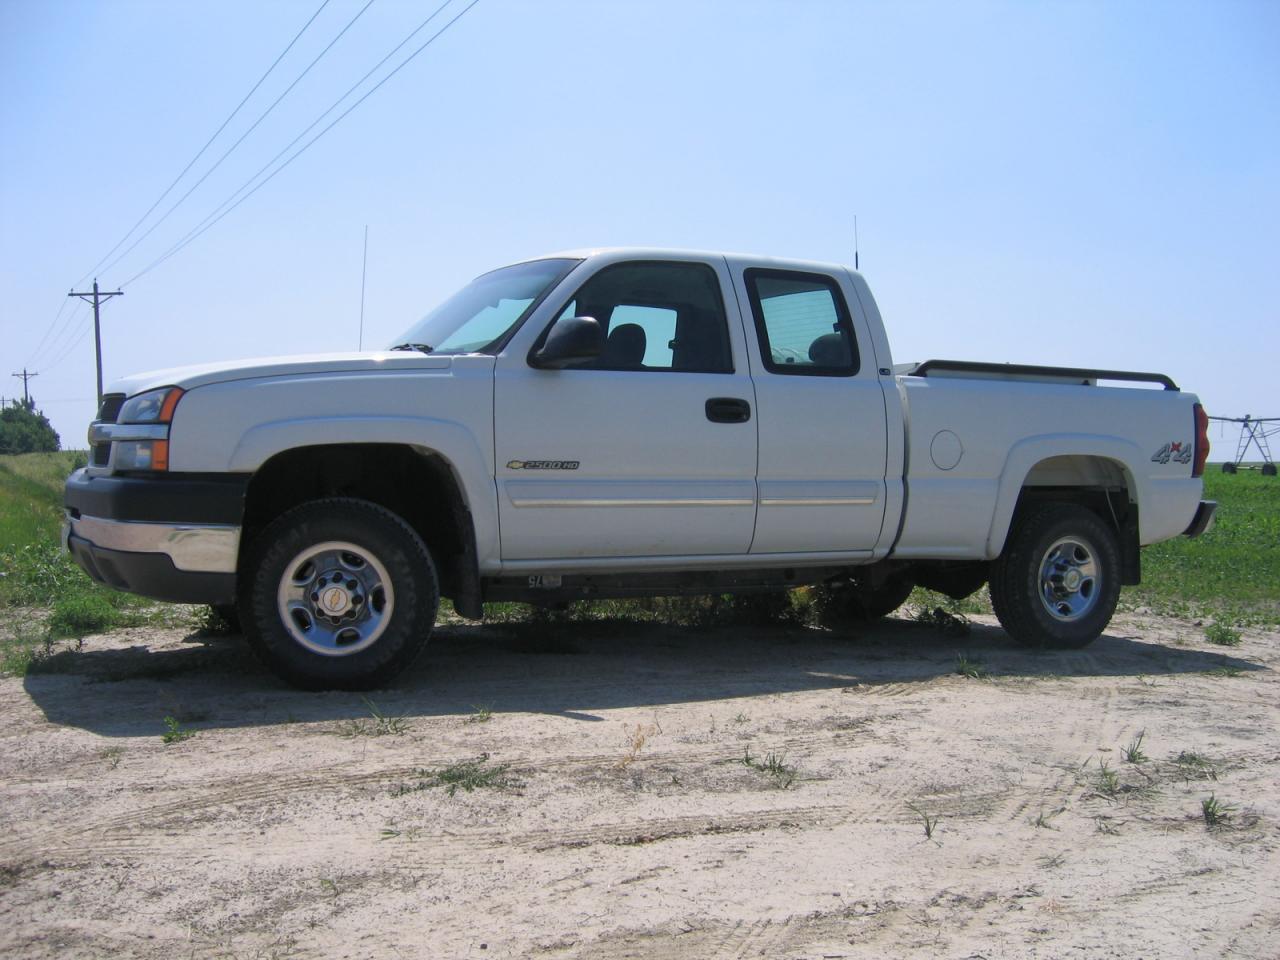 2004 Chevrolet 2500hd Fuse Box Wiring Library 2007 F150 King Cab Diagram 800 1024 1280 1600 Origin Silverado 2500